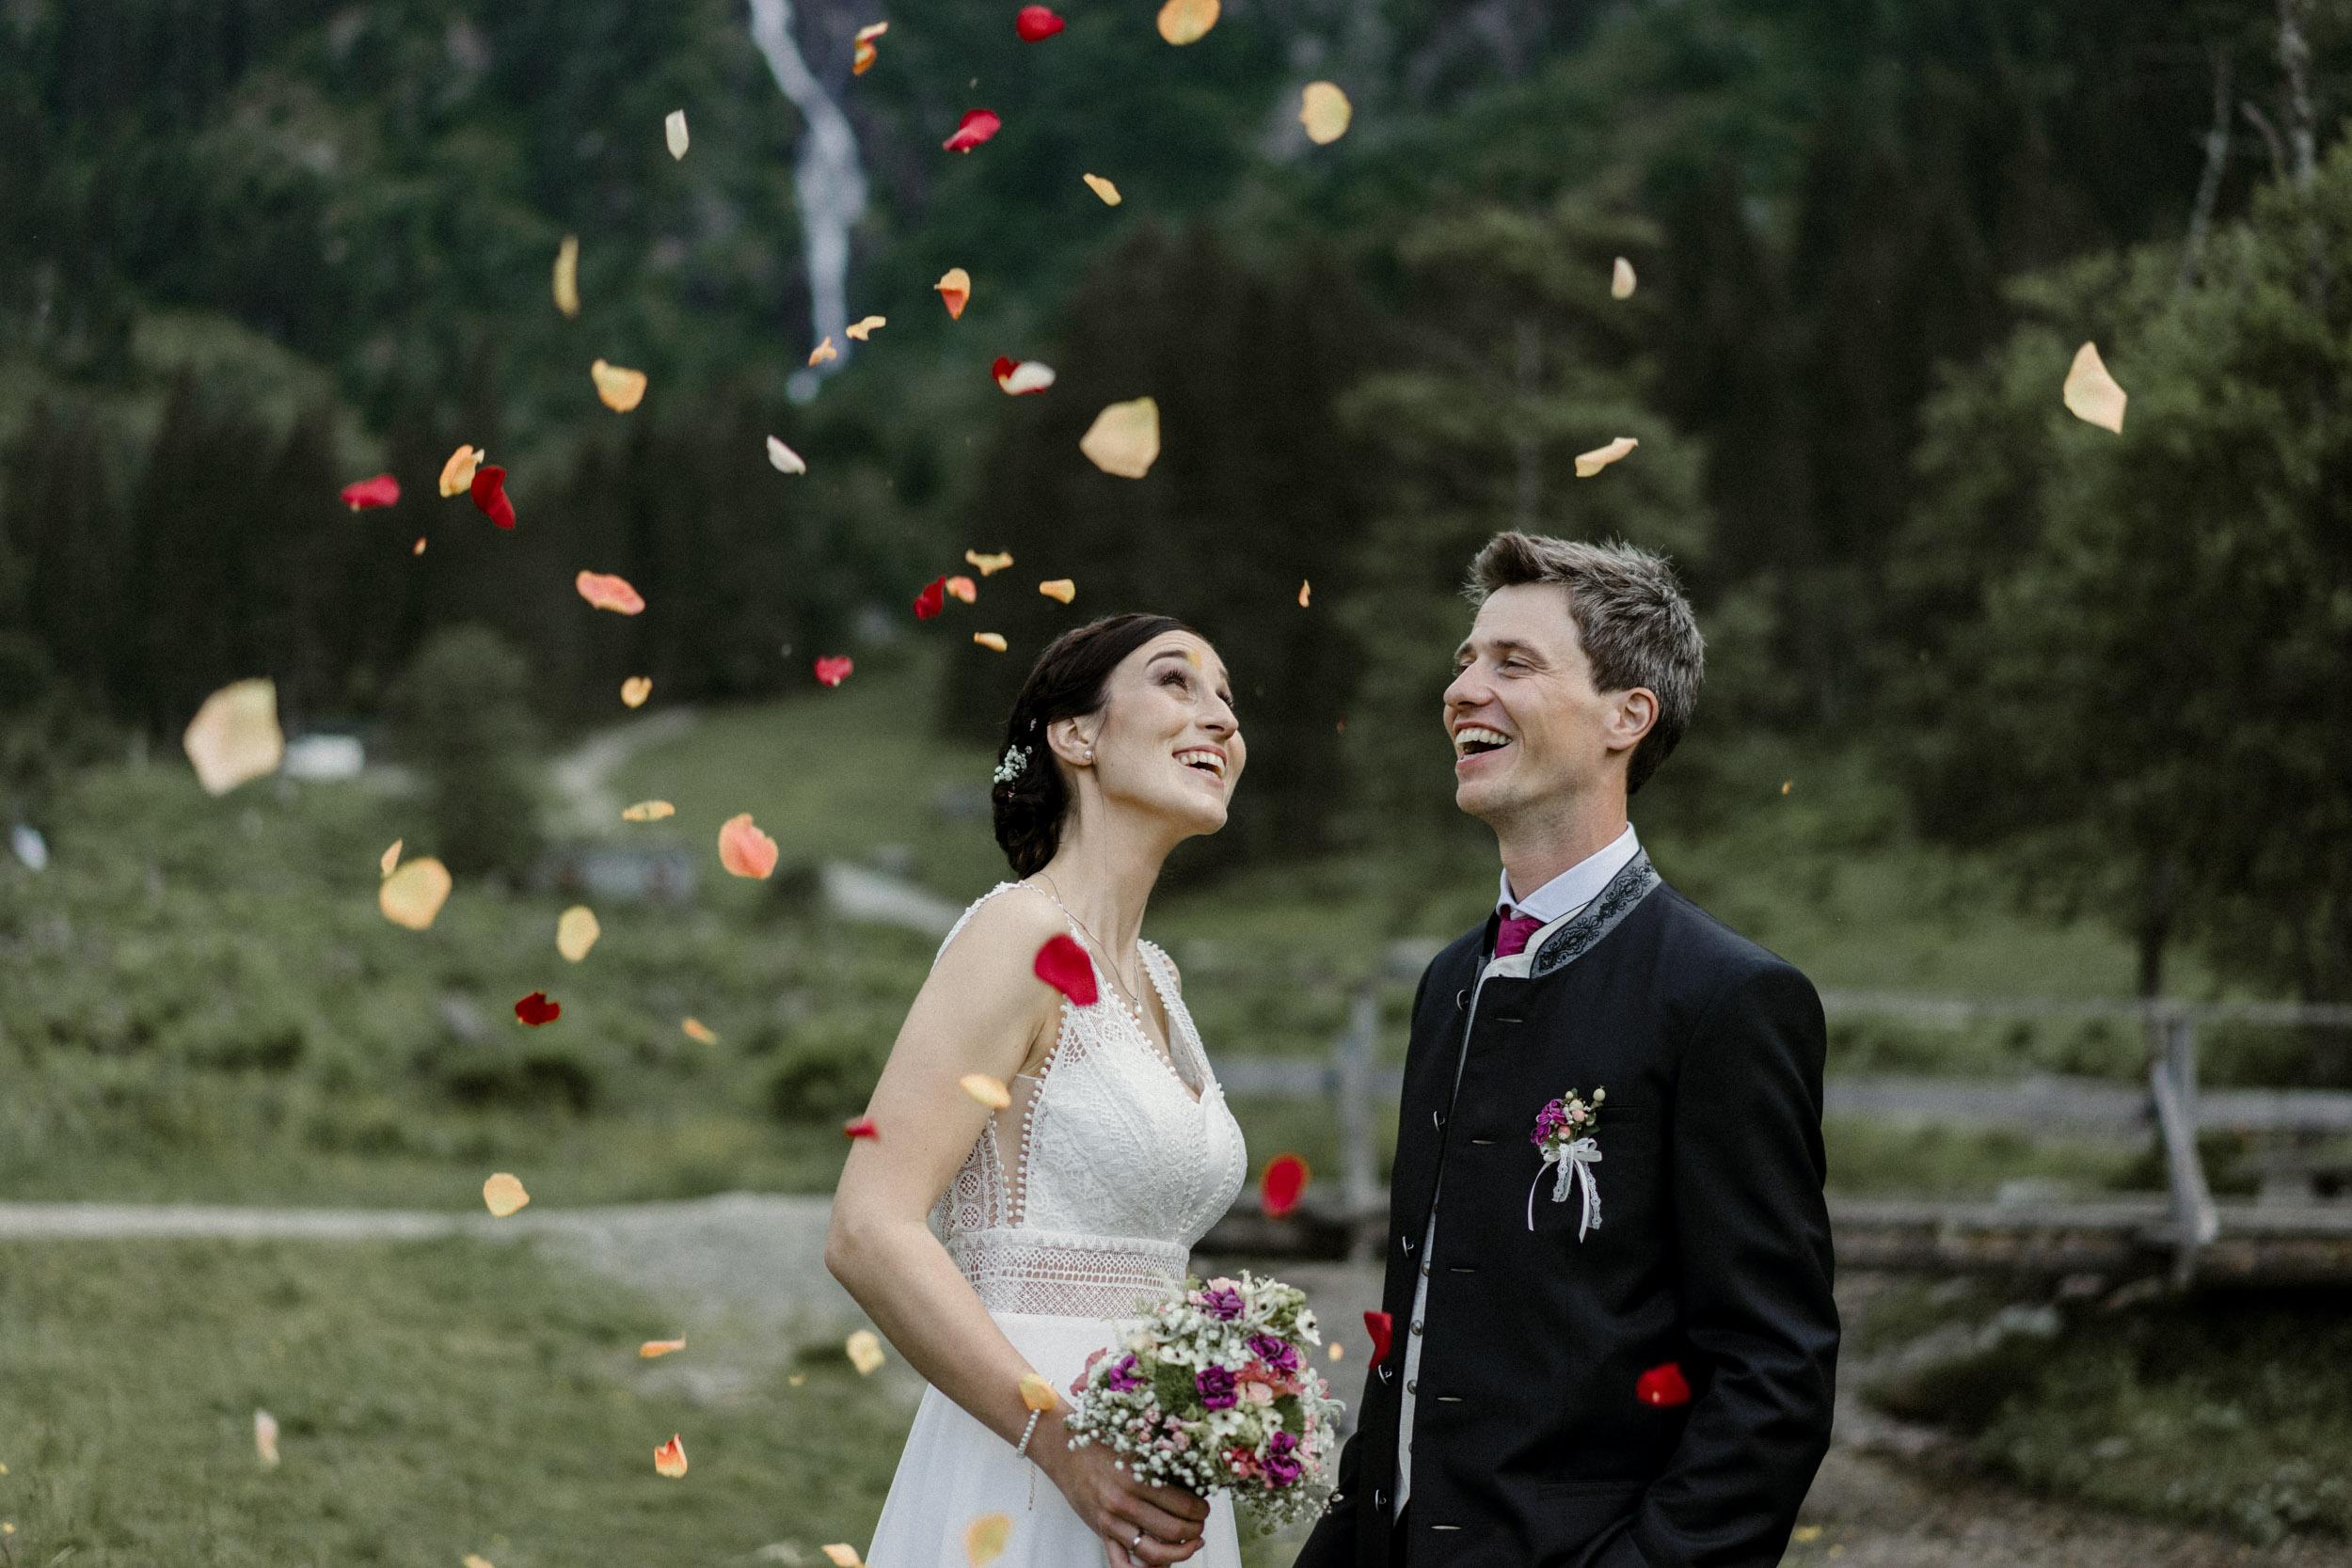 austria_mountain_wedding_photography_countryside_vienna-36.jpg